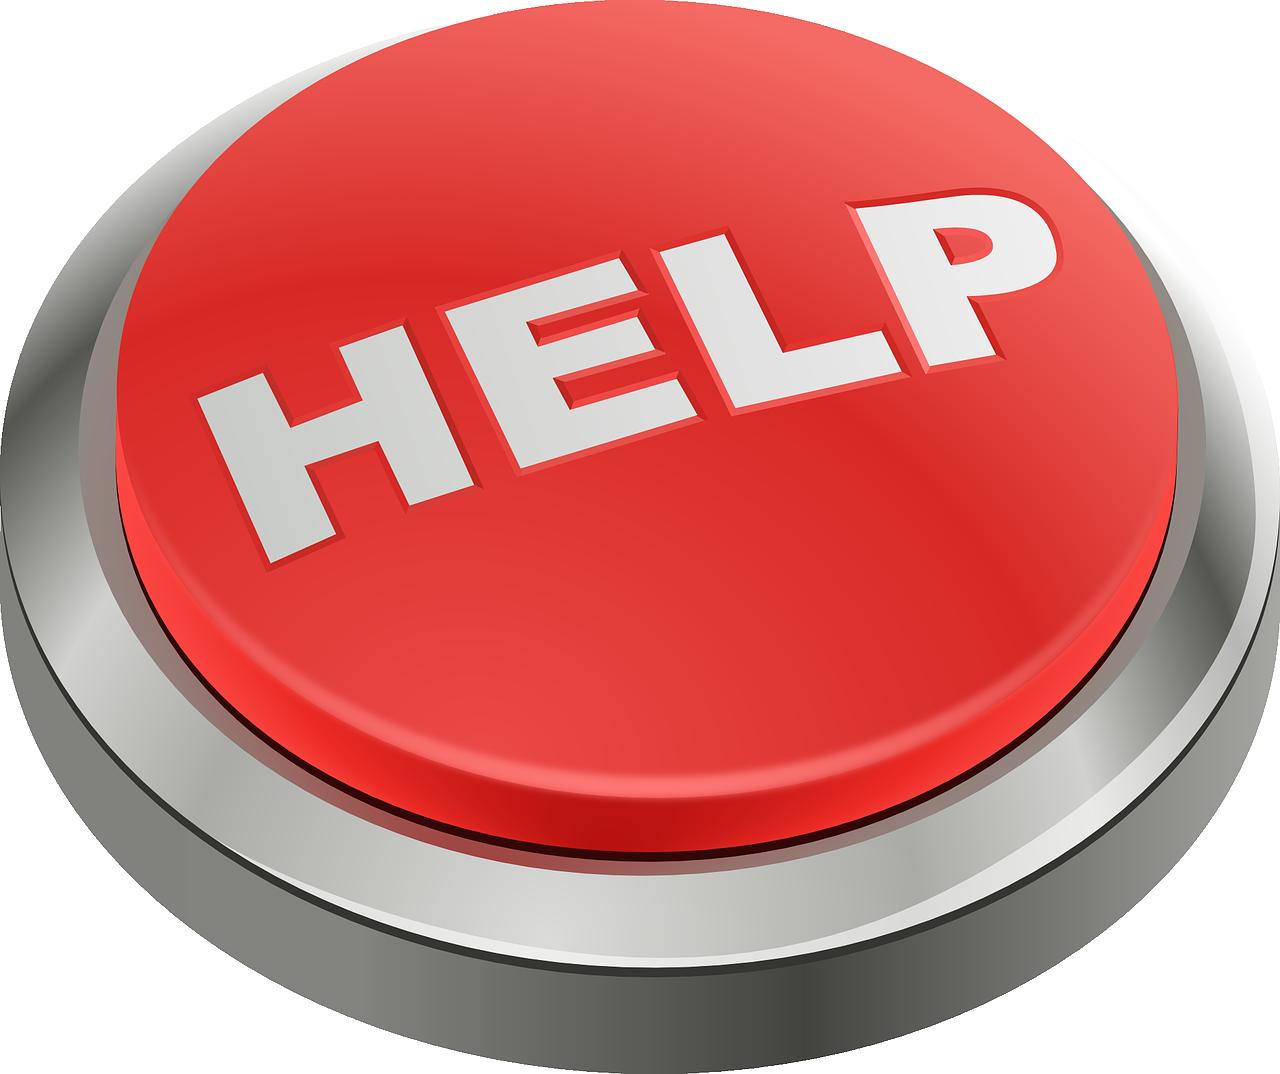 help 153094 1280